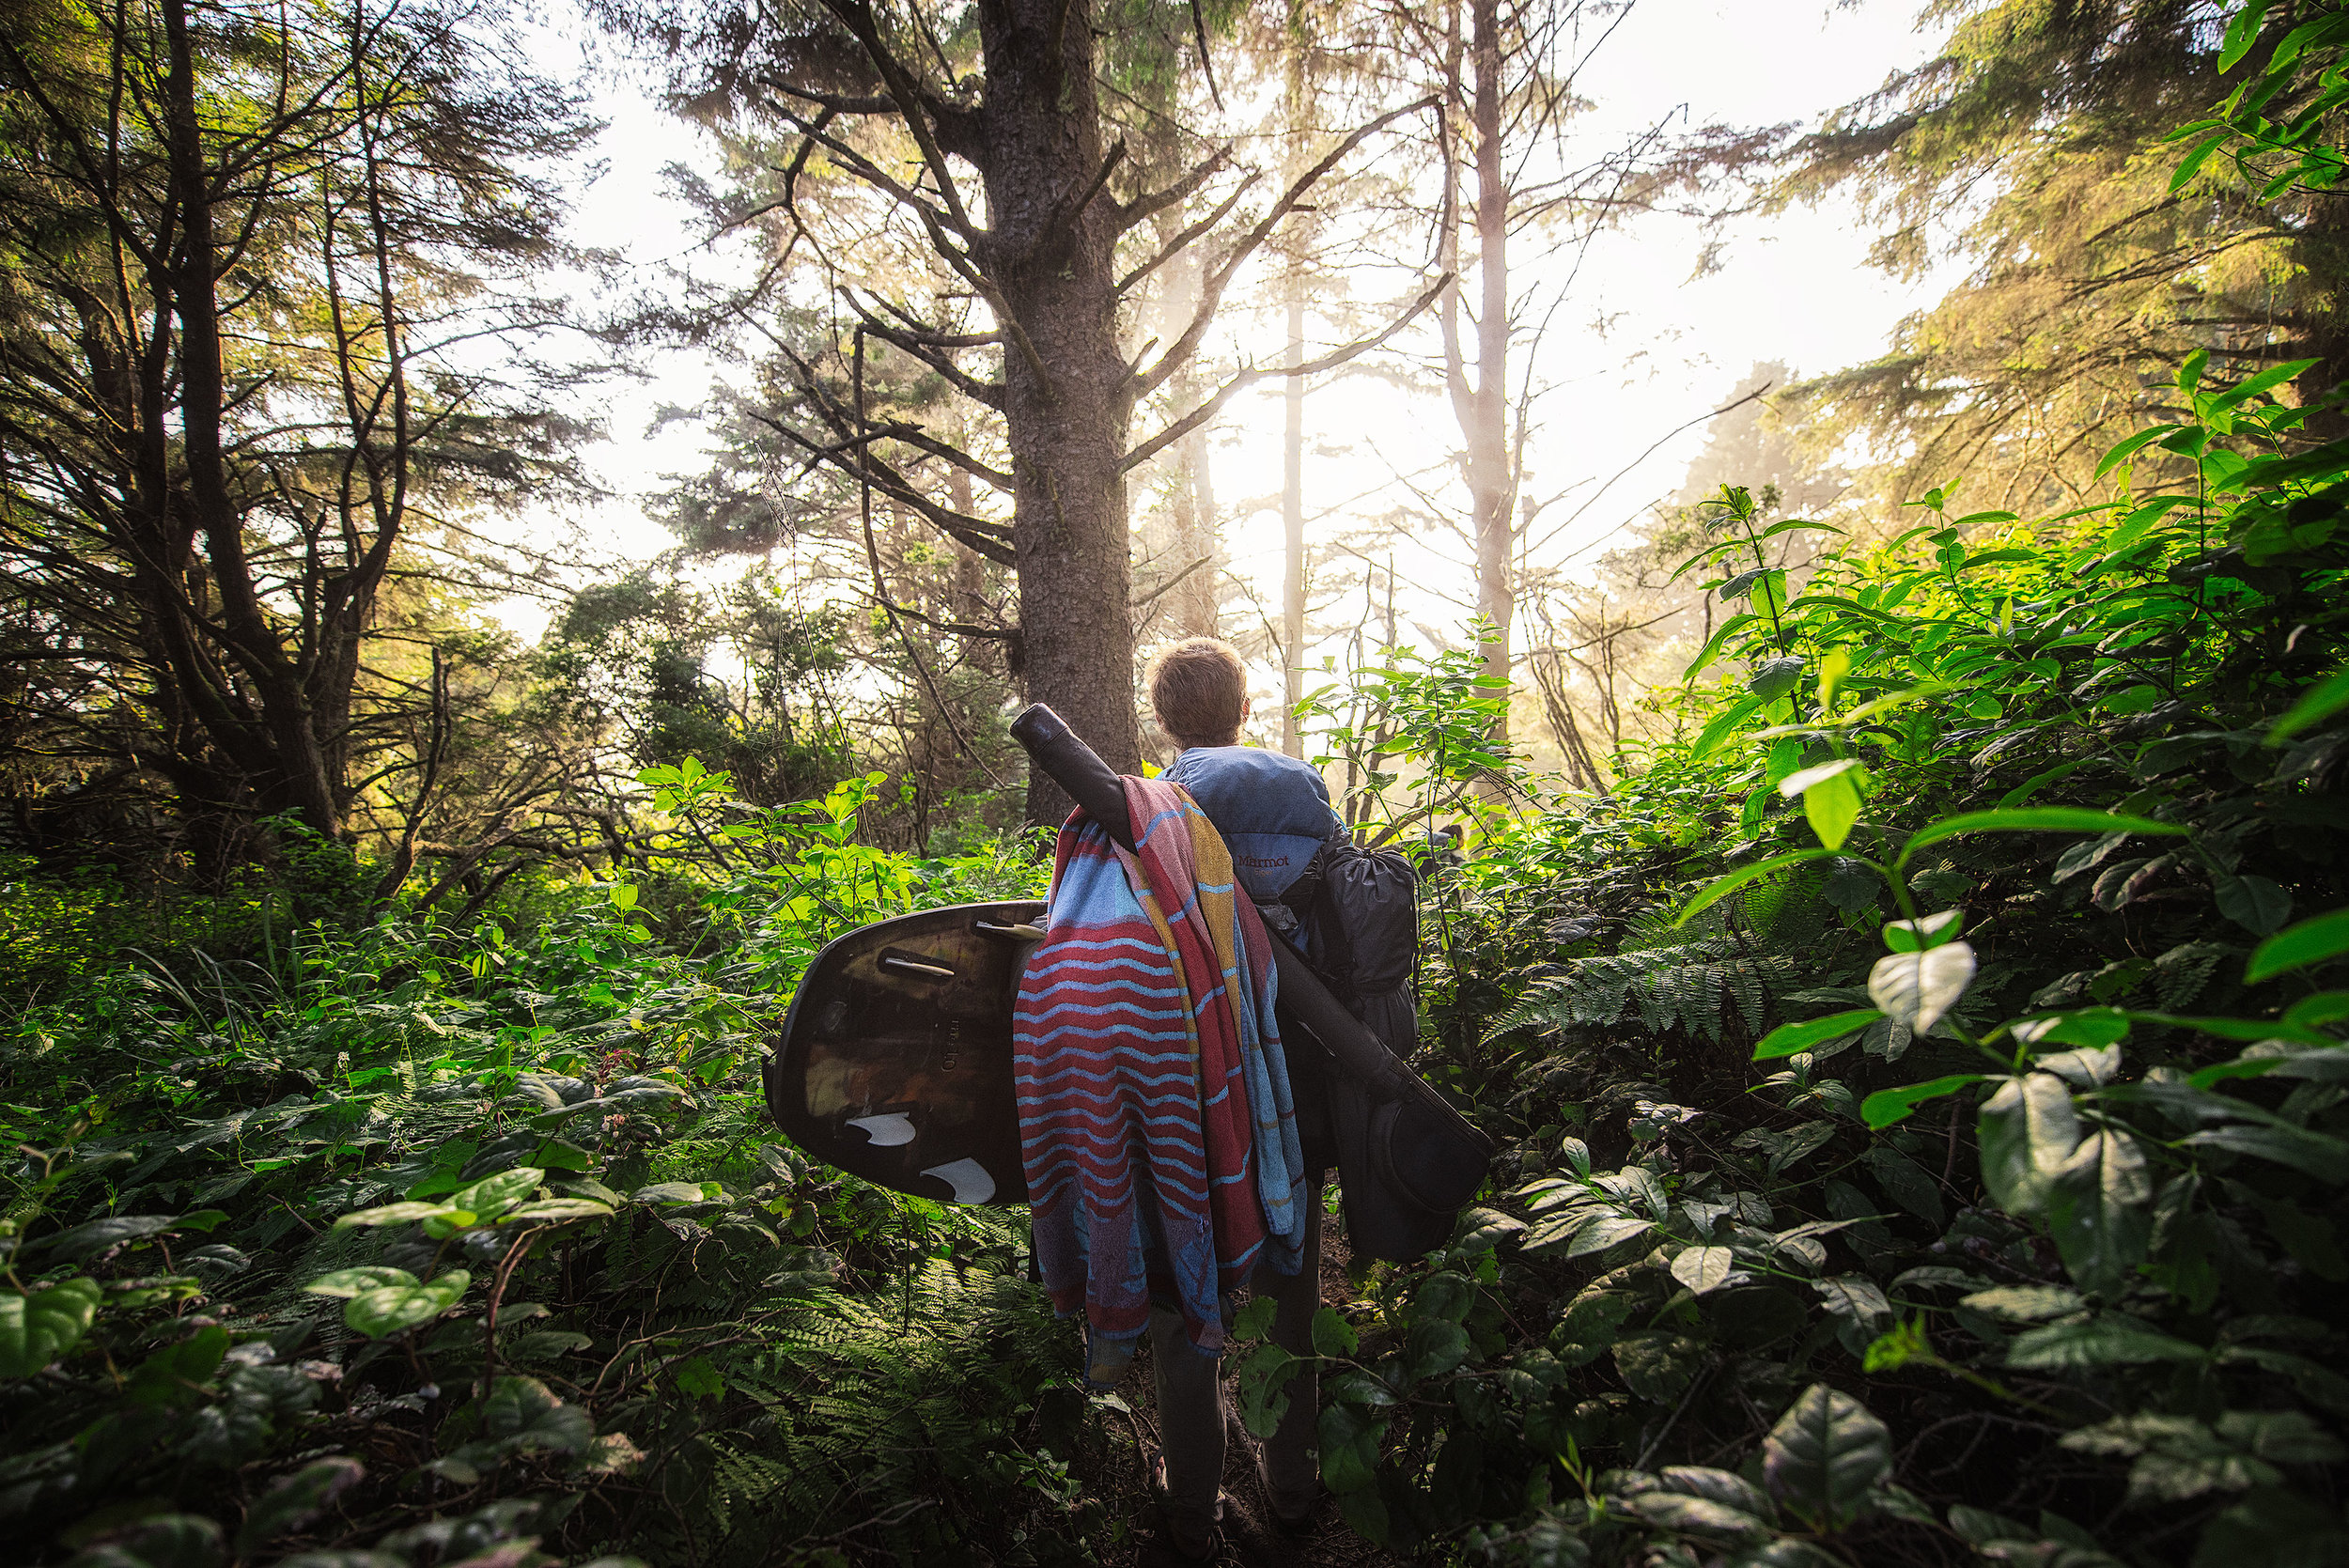 austin-trigg-redwood-water-bottle-beach-forest-california-adventure-tree-surfboard-camping-hike.jpg